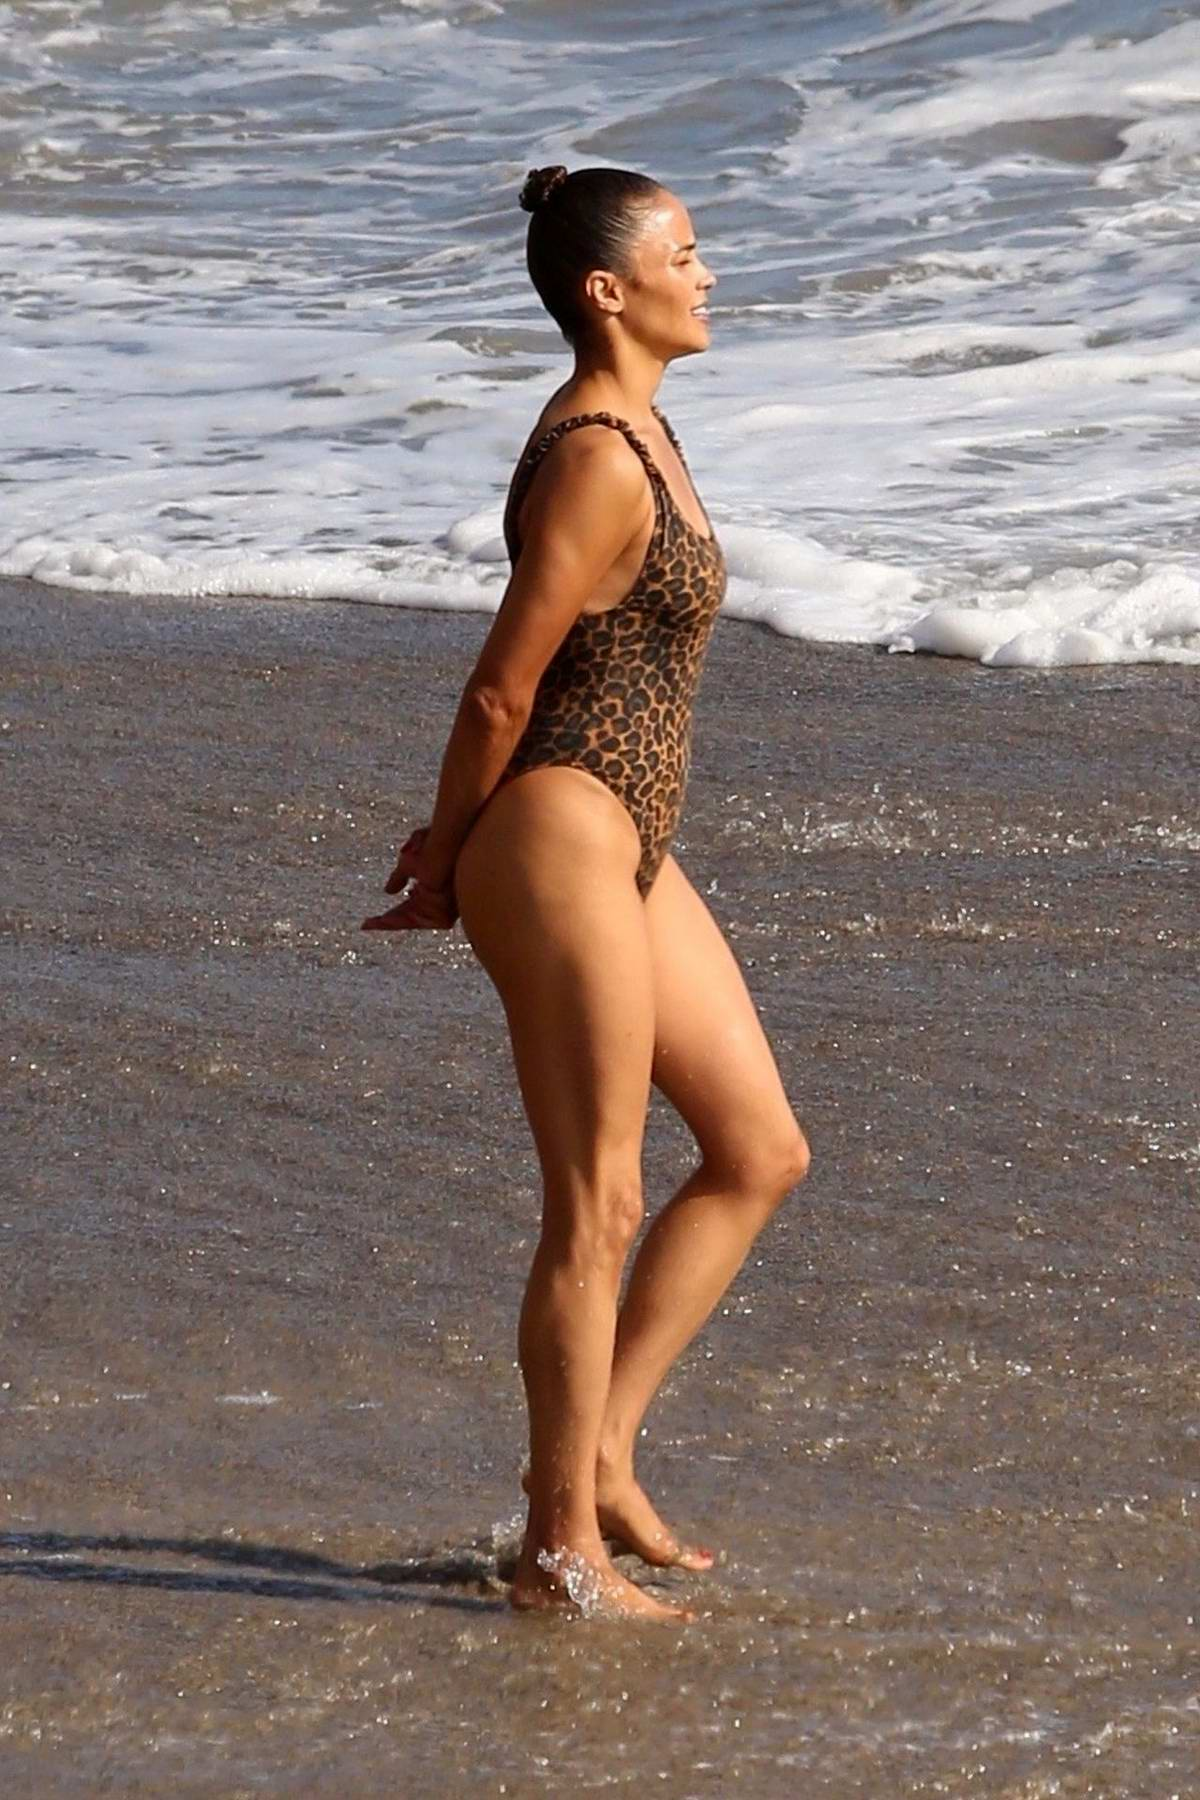 paula patton wears a leopard print swimsuit as she hits